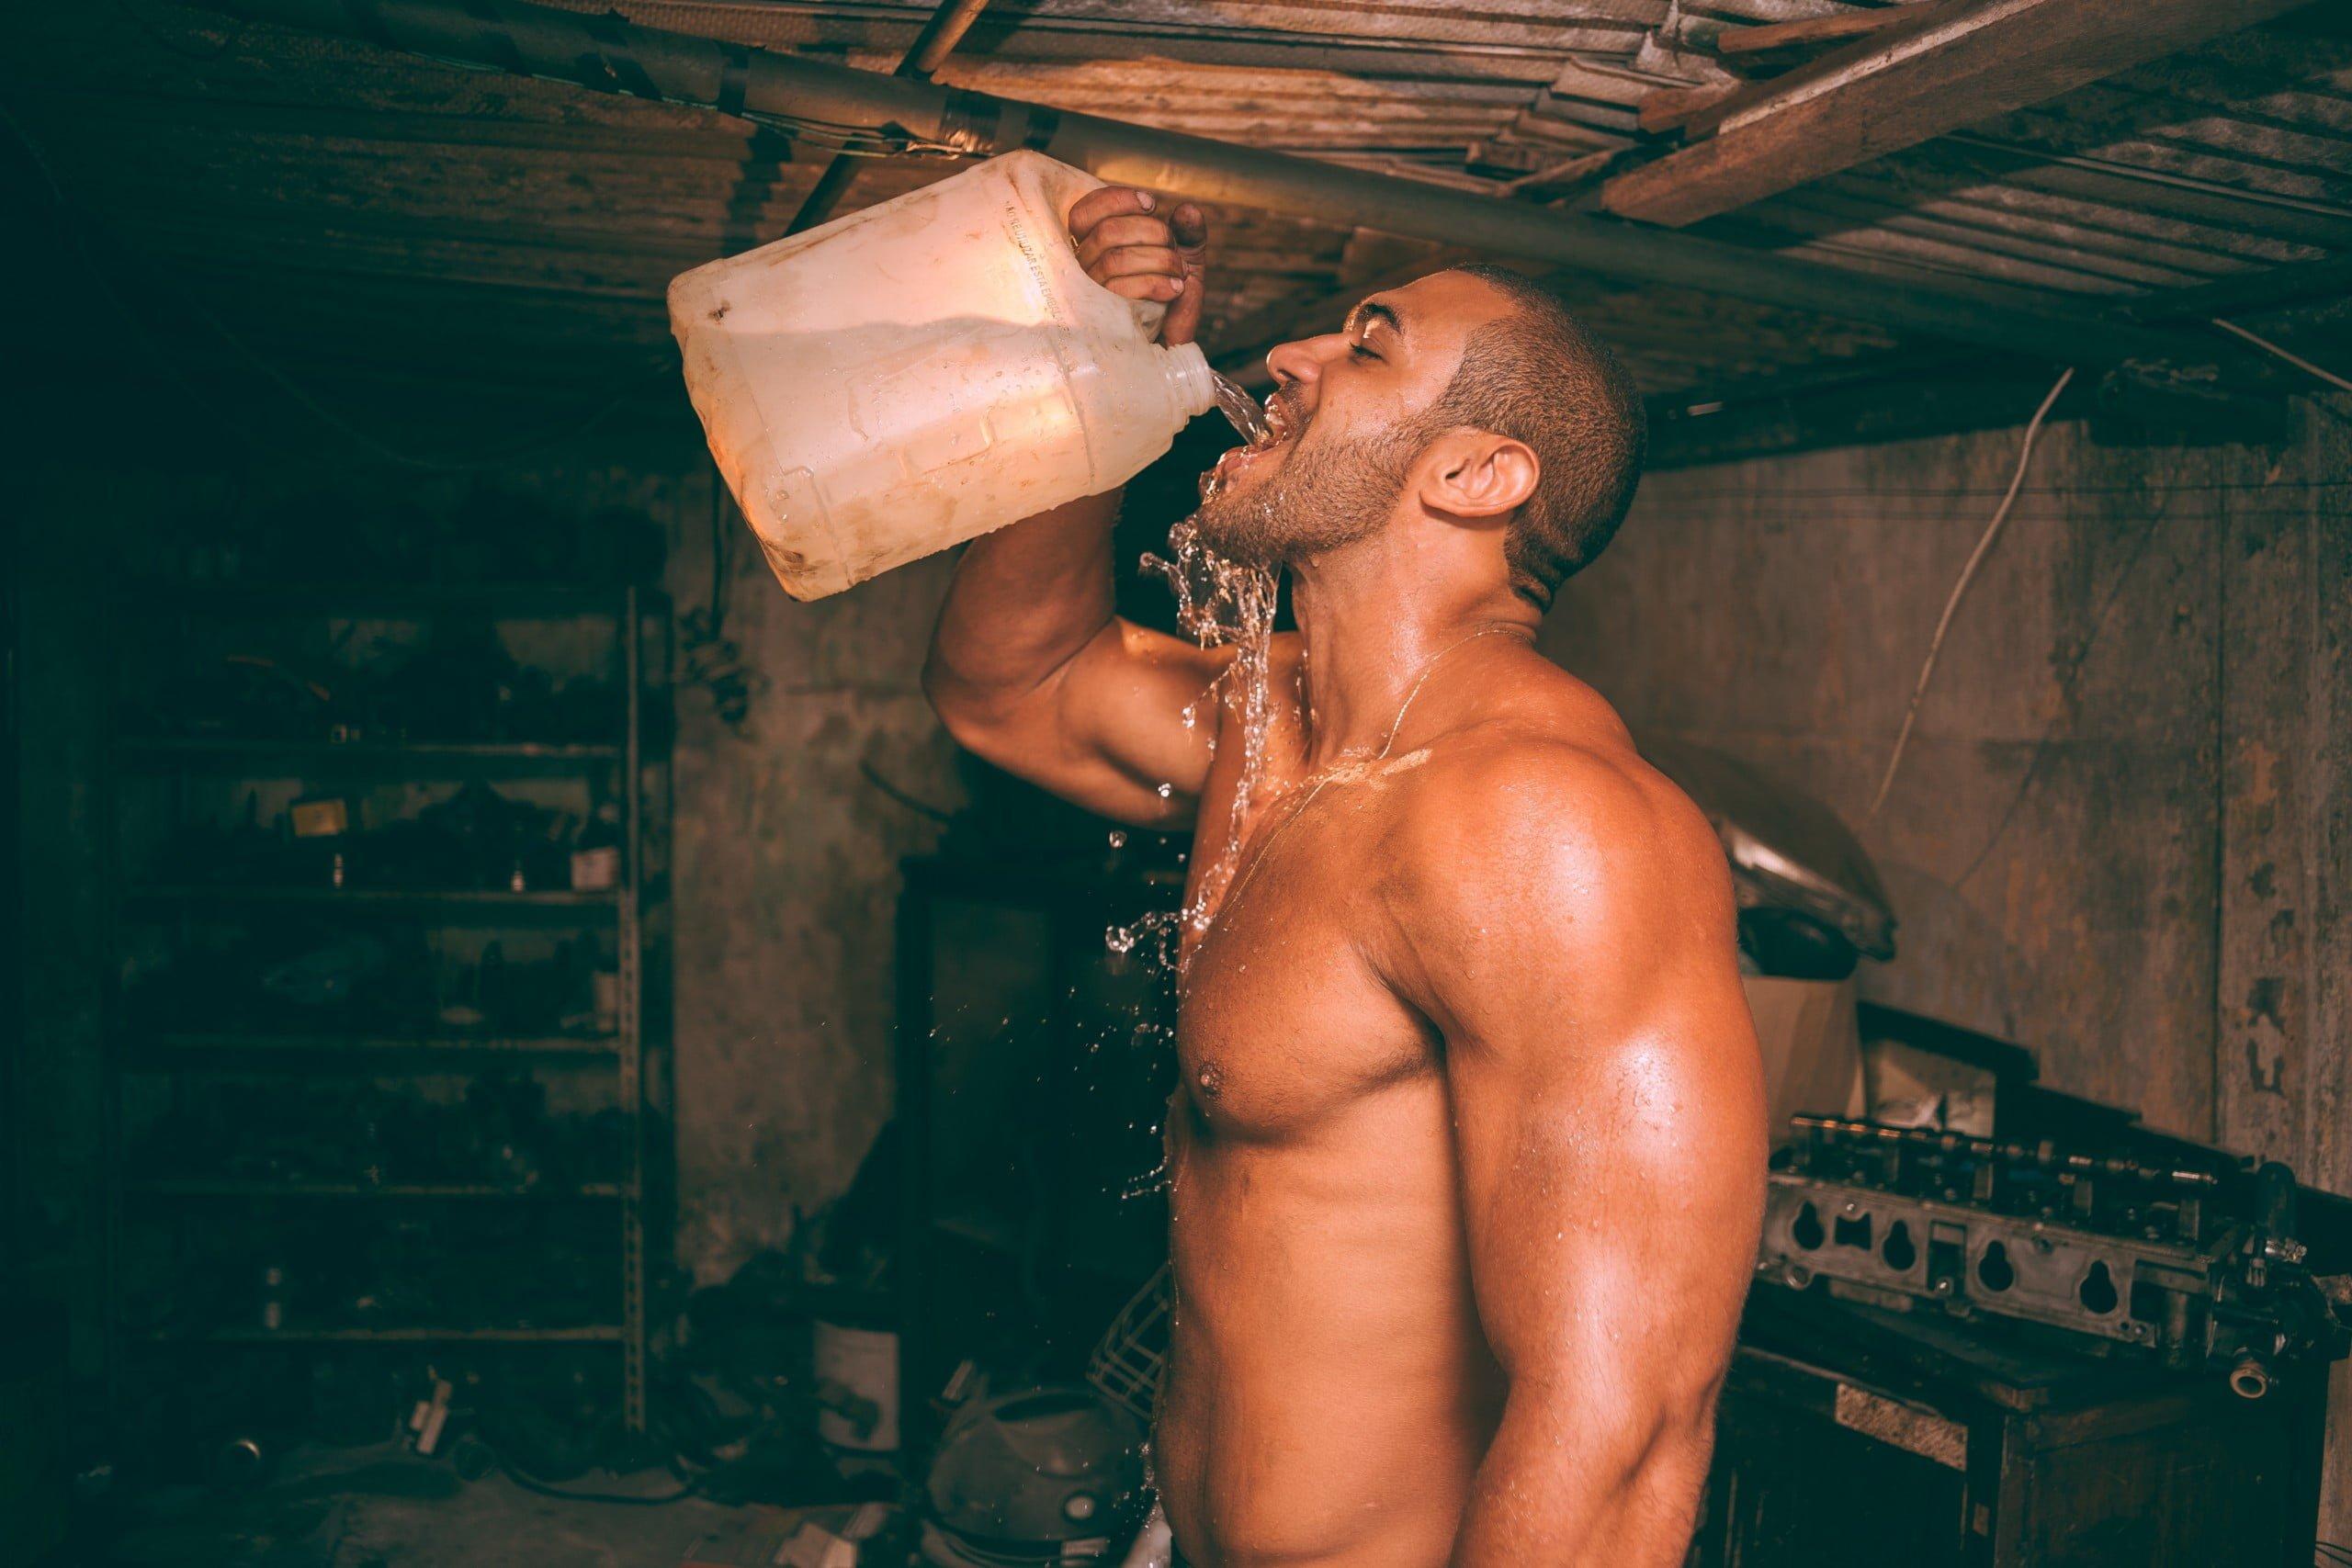 Chugging Water